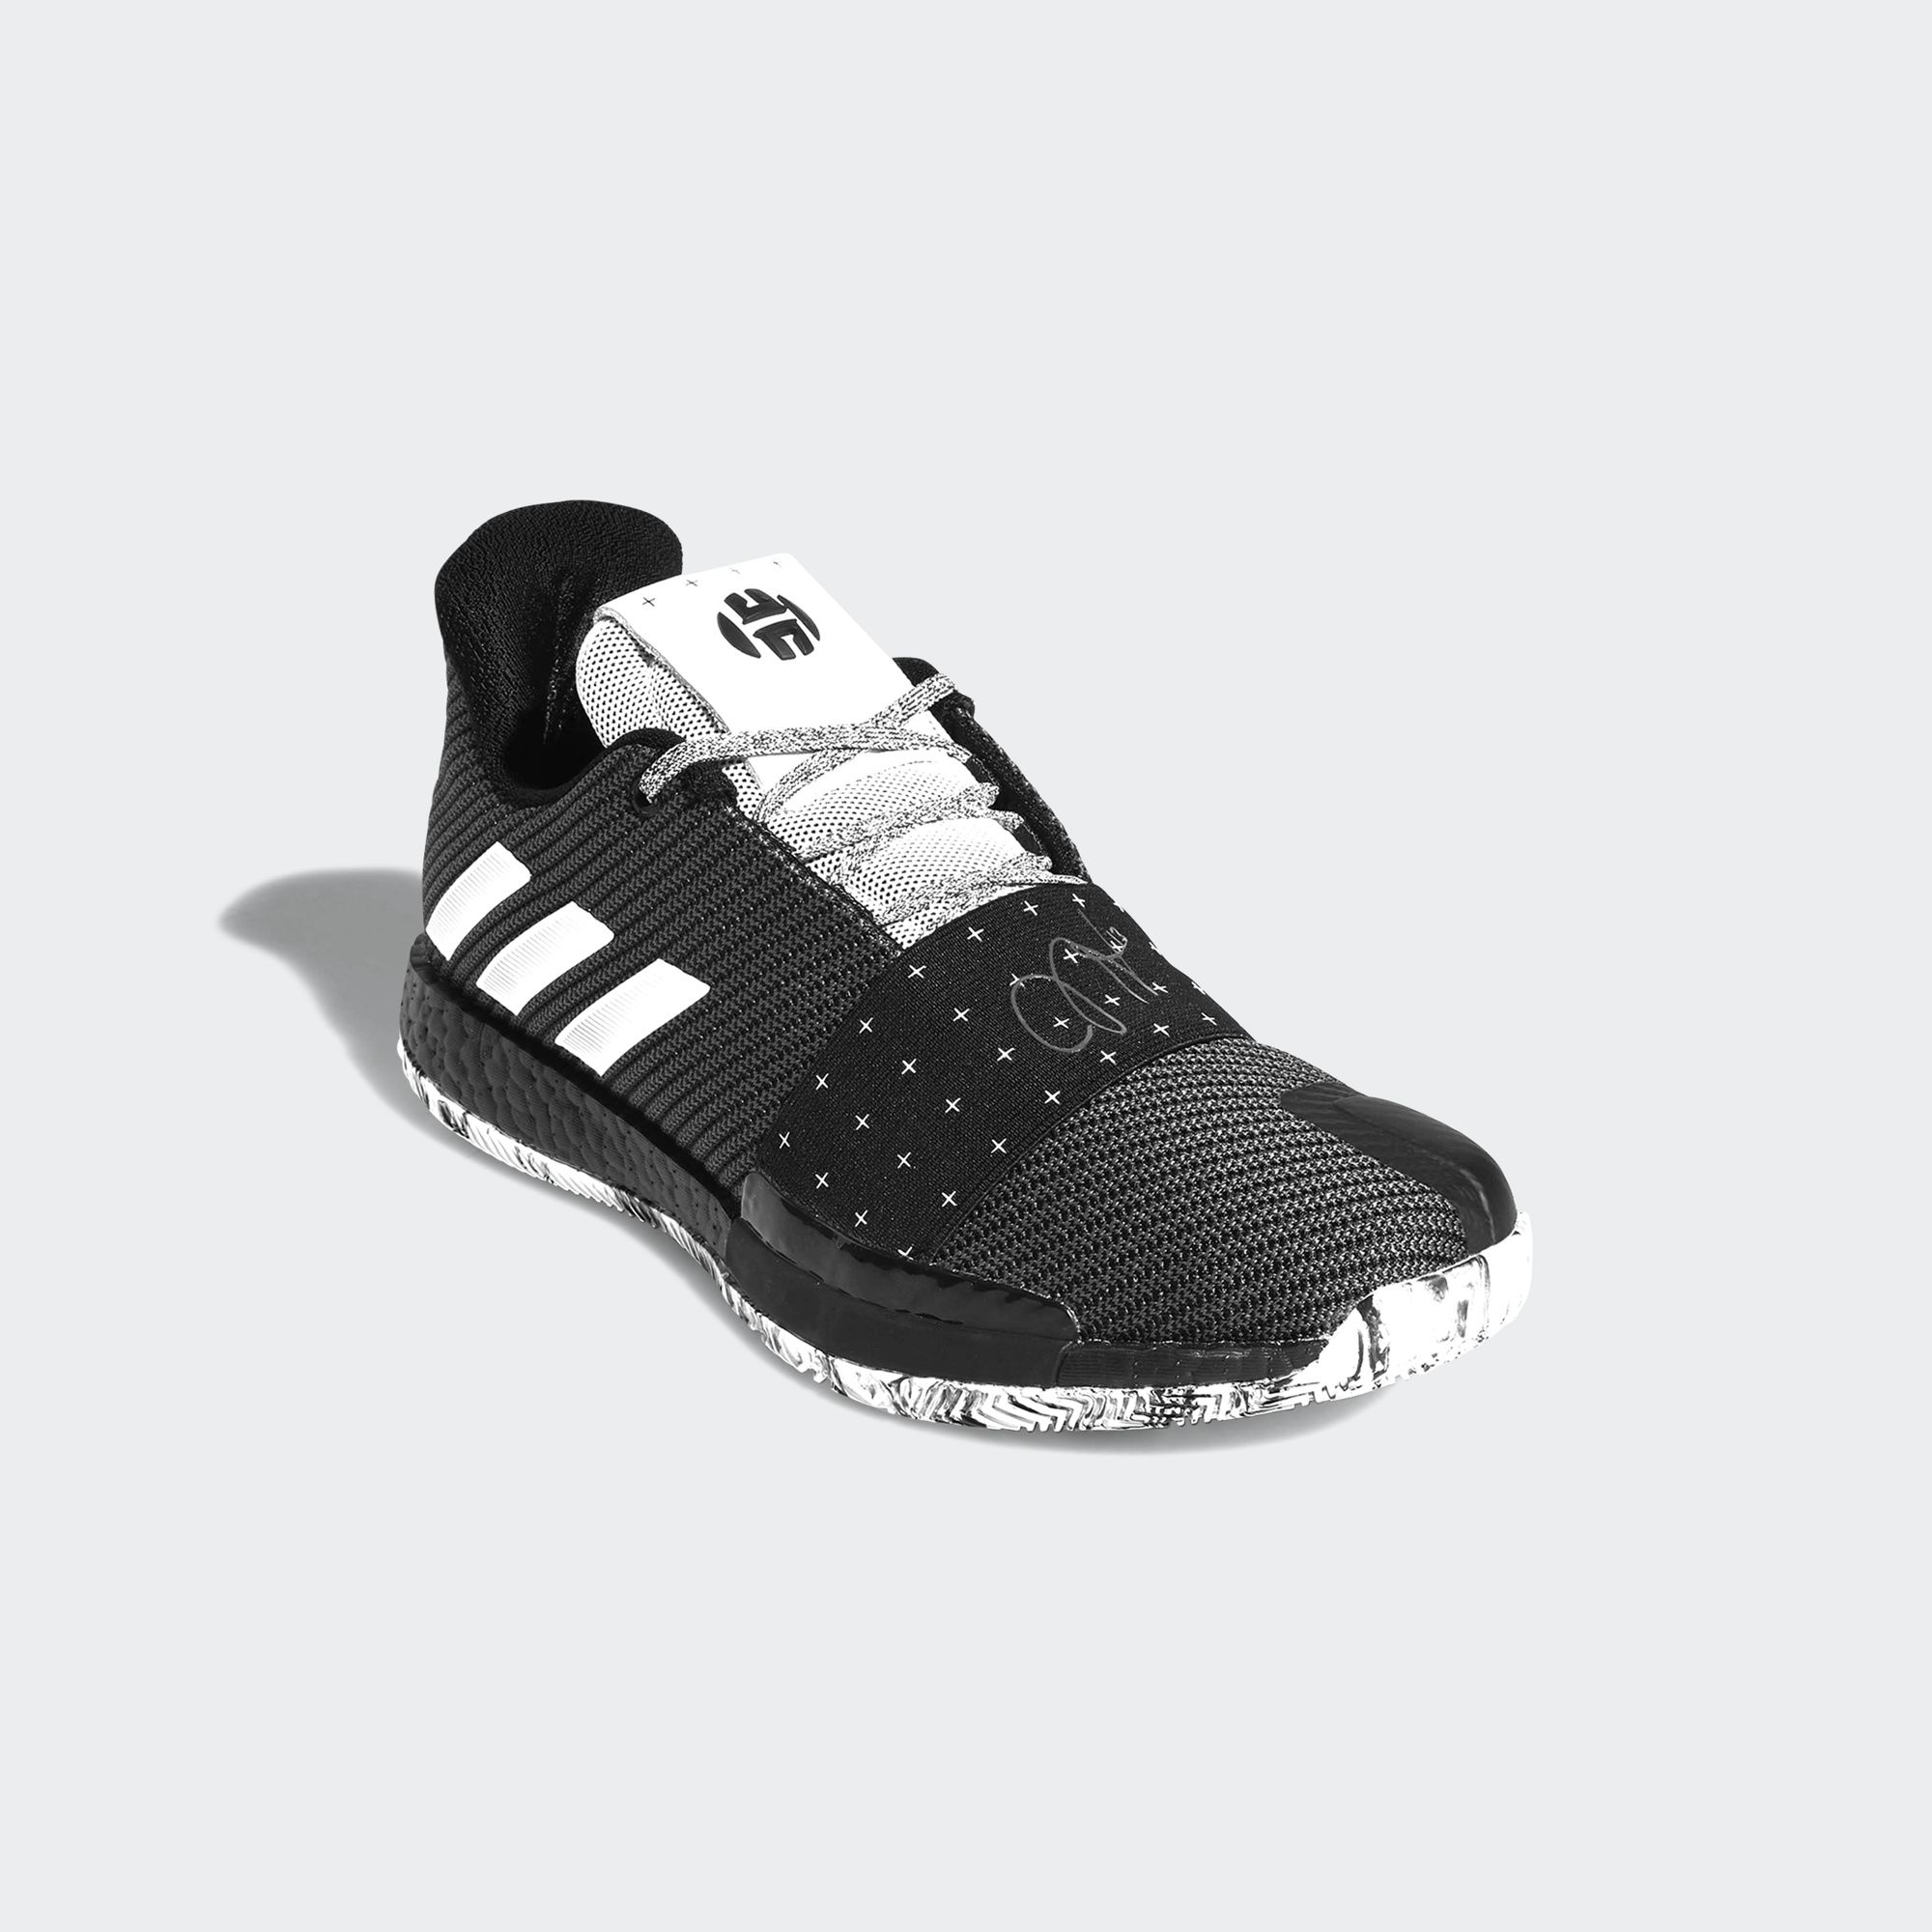 adidas harden vol 3 release date 4